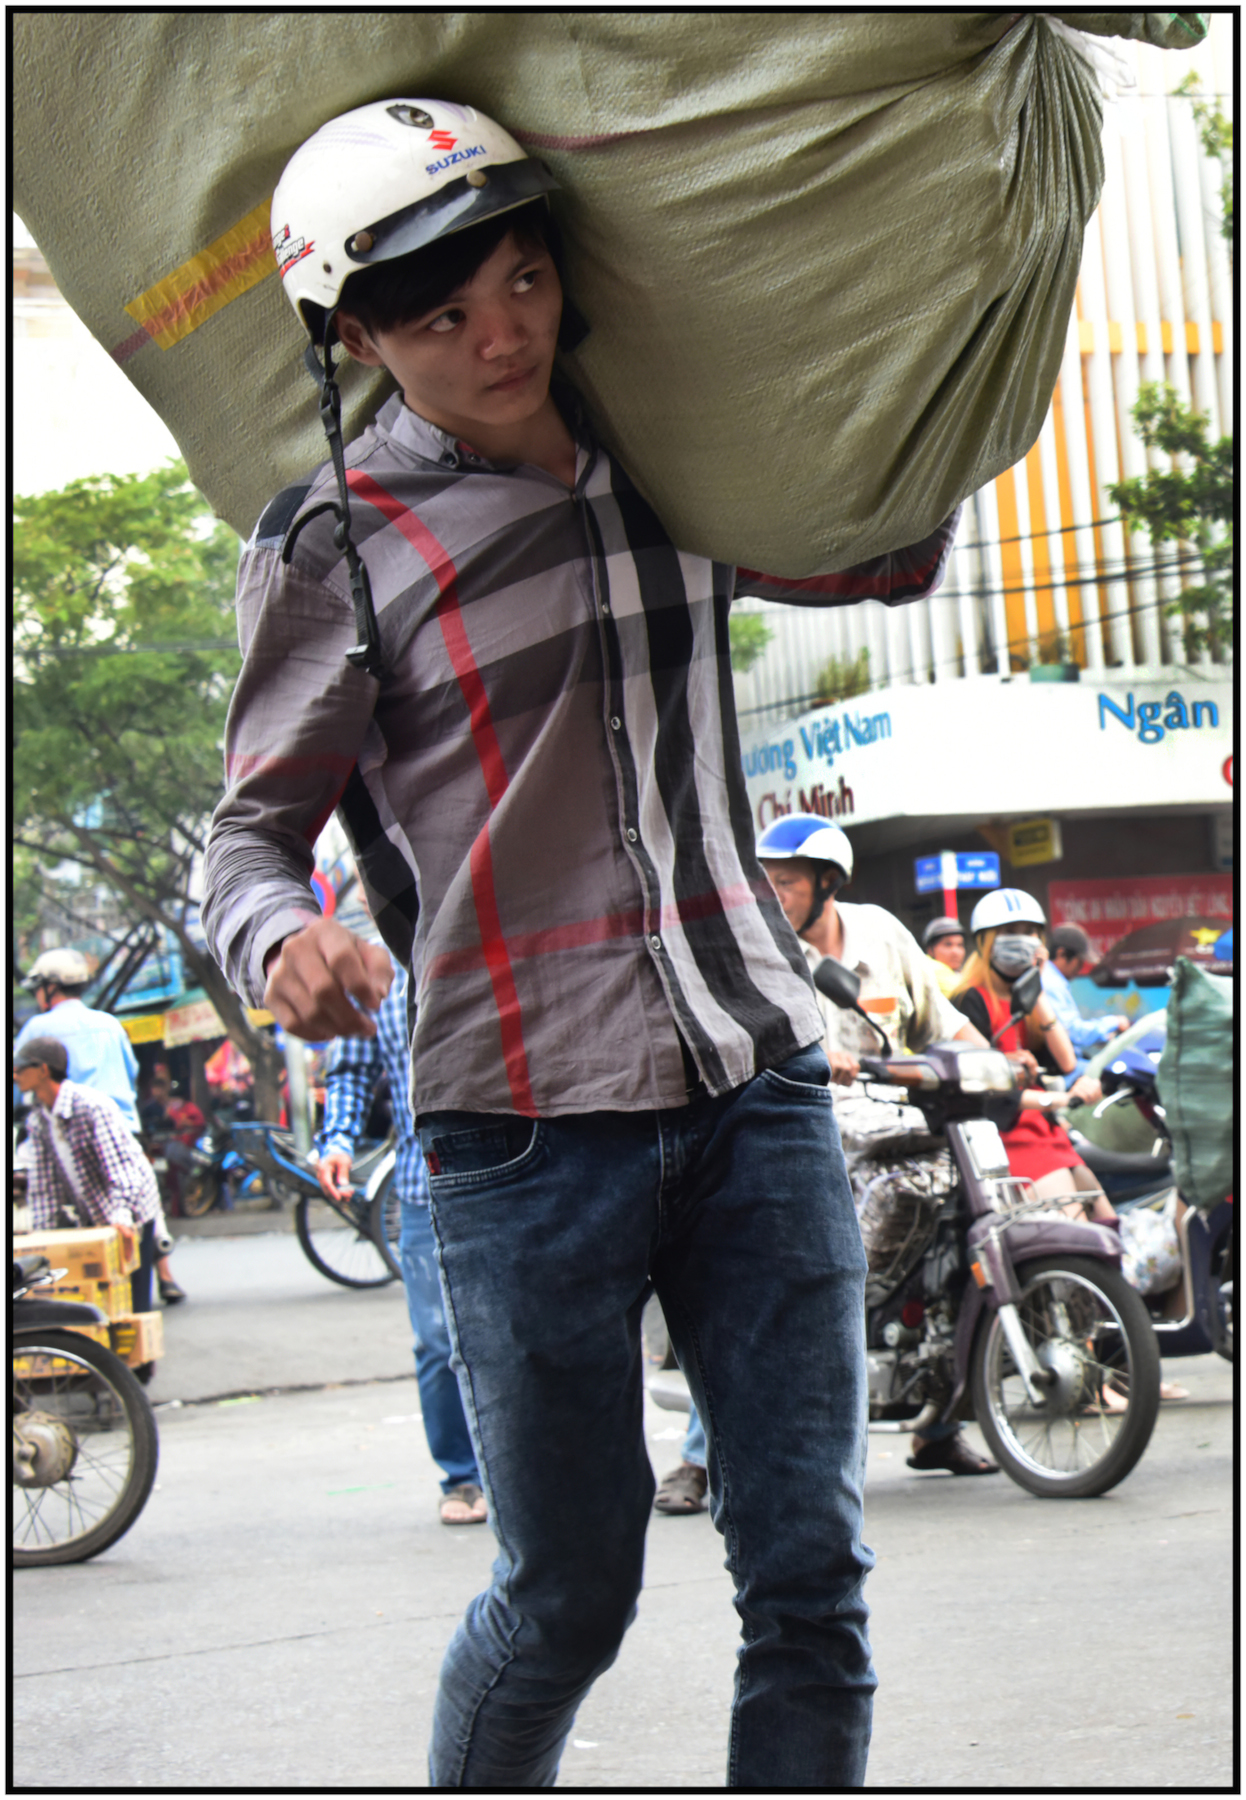 Worker carries merchandise from truck to Binh Tay Market, Cholon, Saigon/HCMC, Dec. 2015. #4147